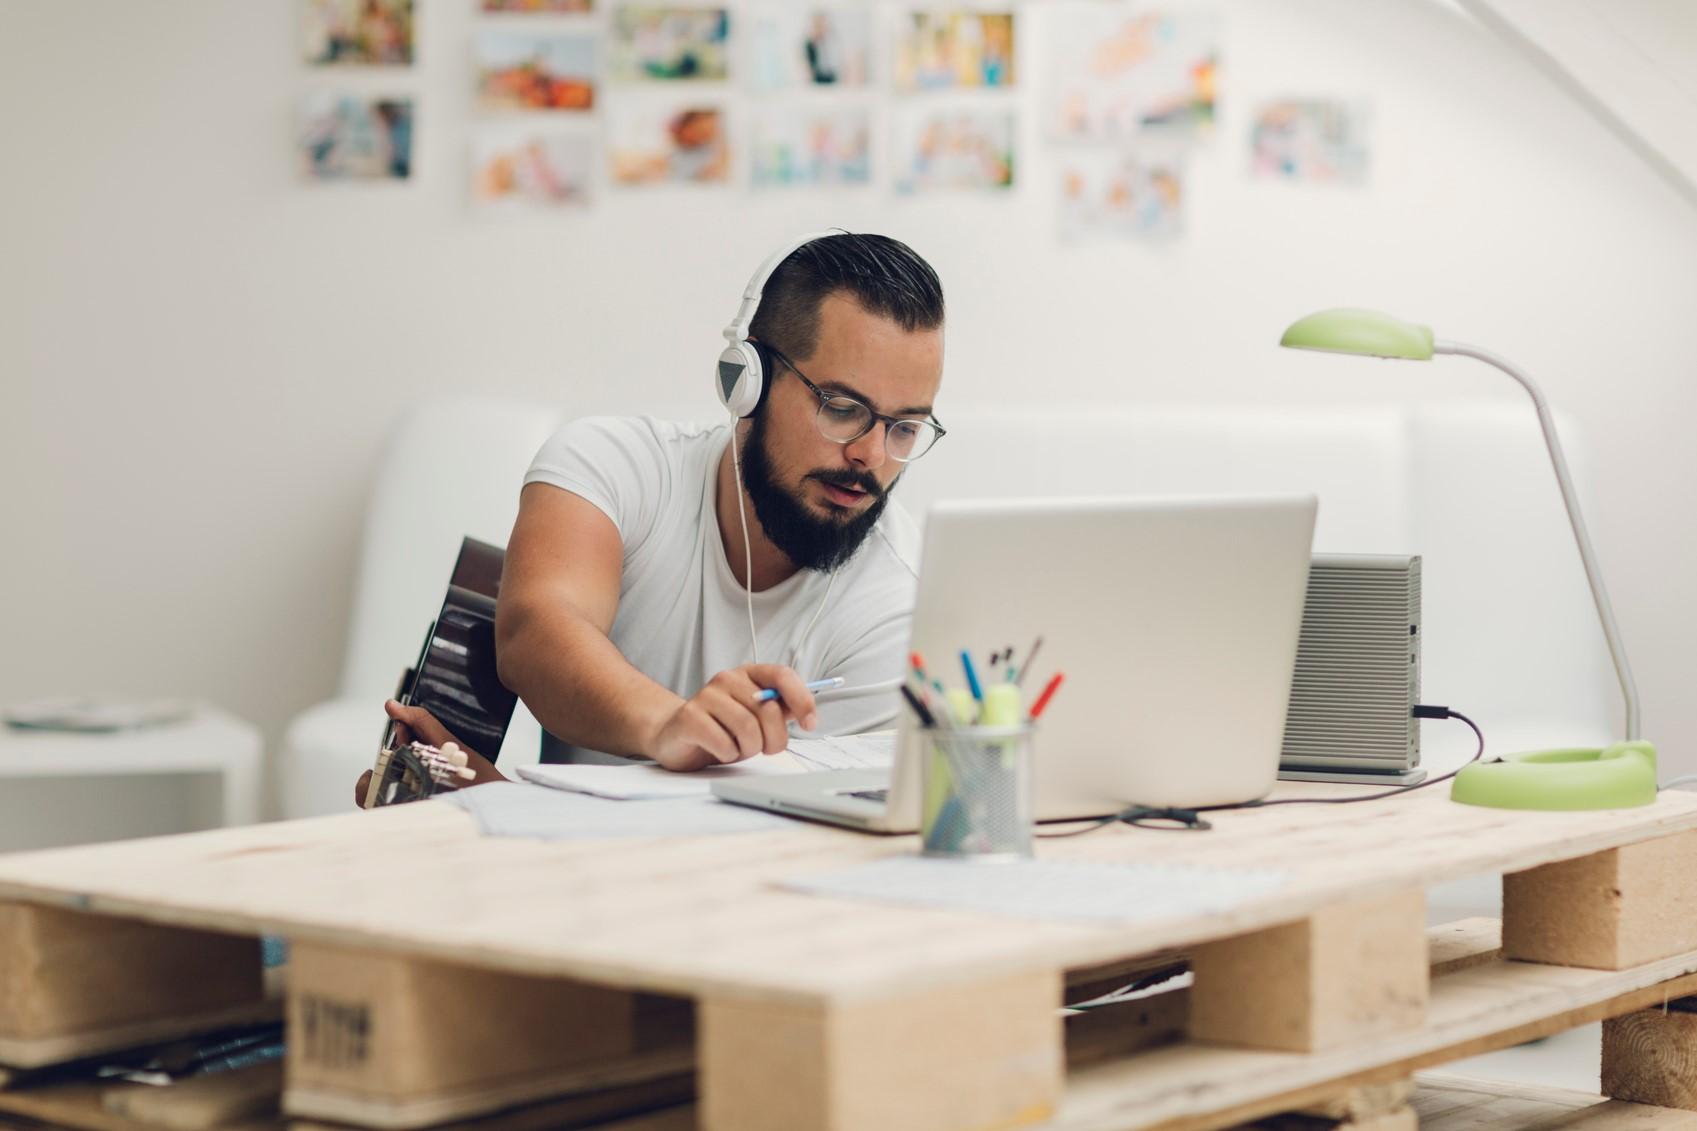 Freelance topic удаленная работа на дому через интернет пермь